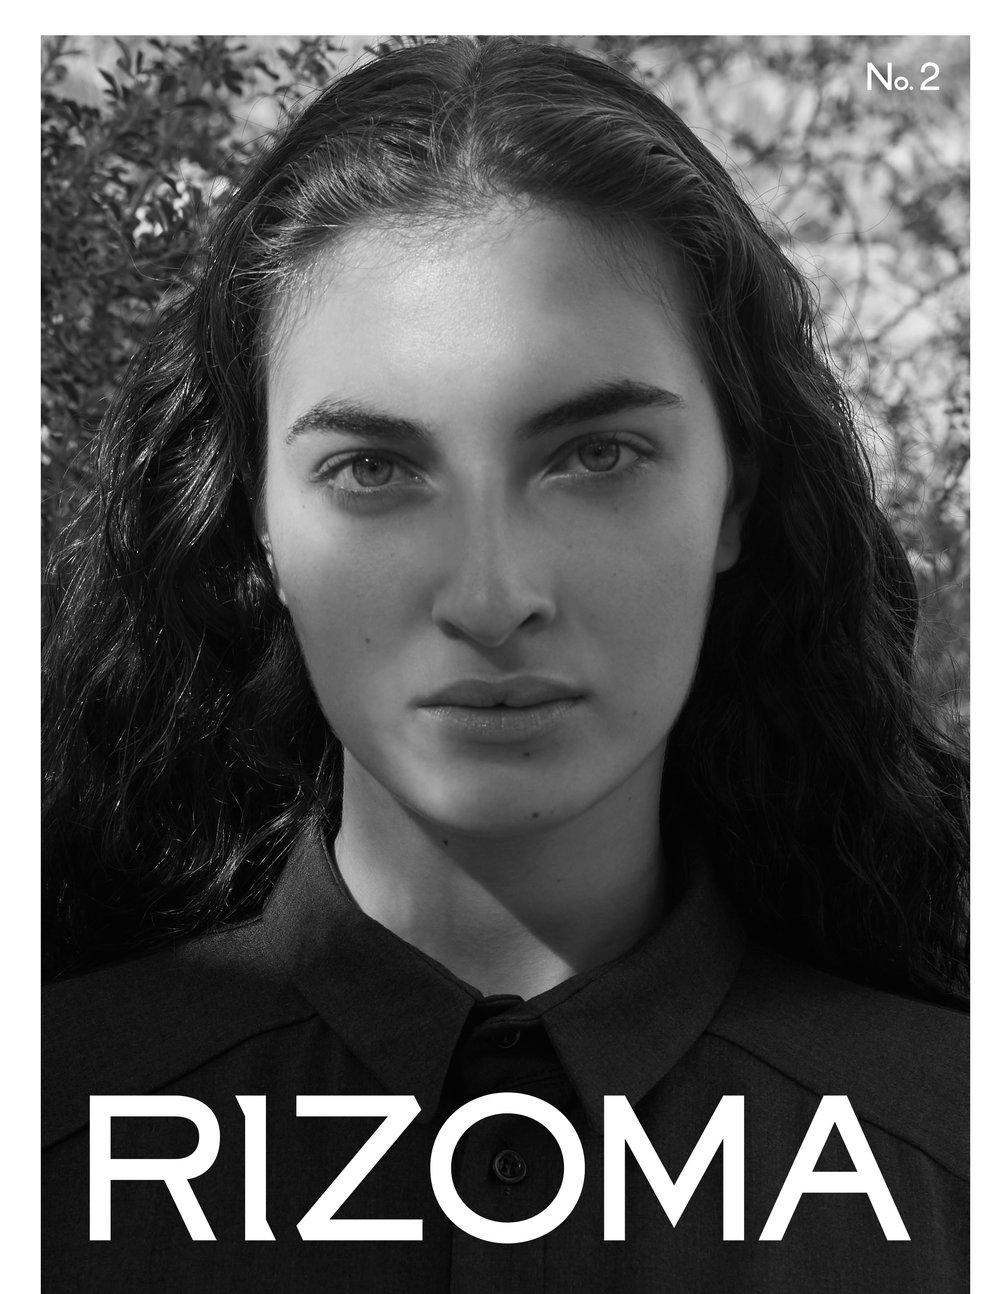 wQ3RHIZOME-COVER-TEMPLATE 3.21.15 PM.jpg